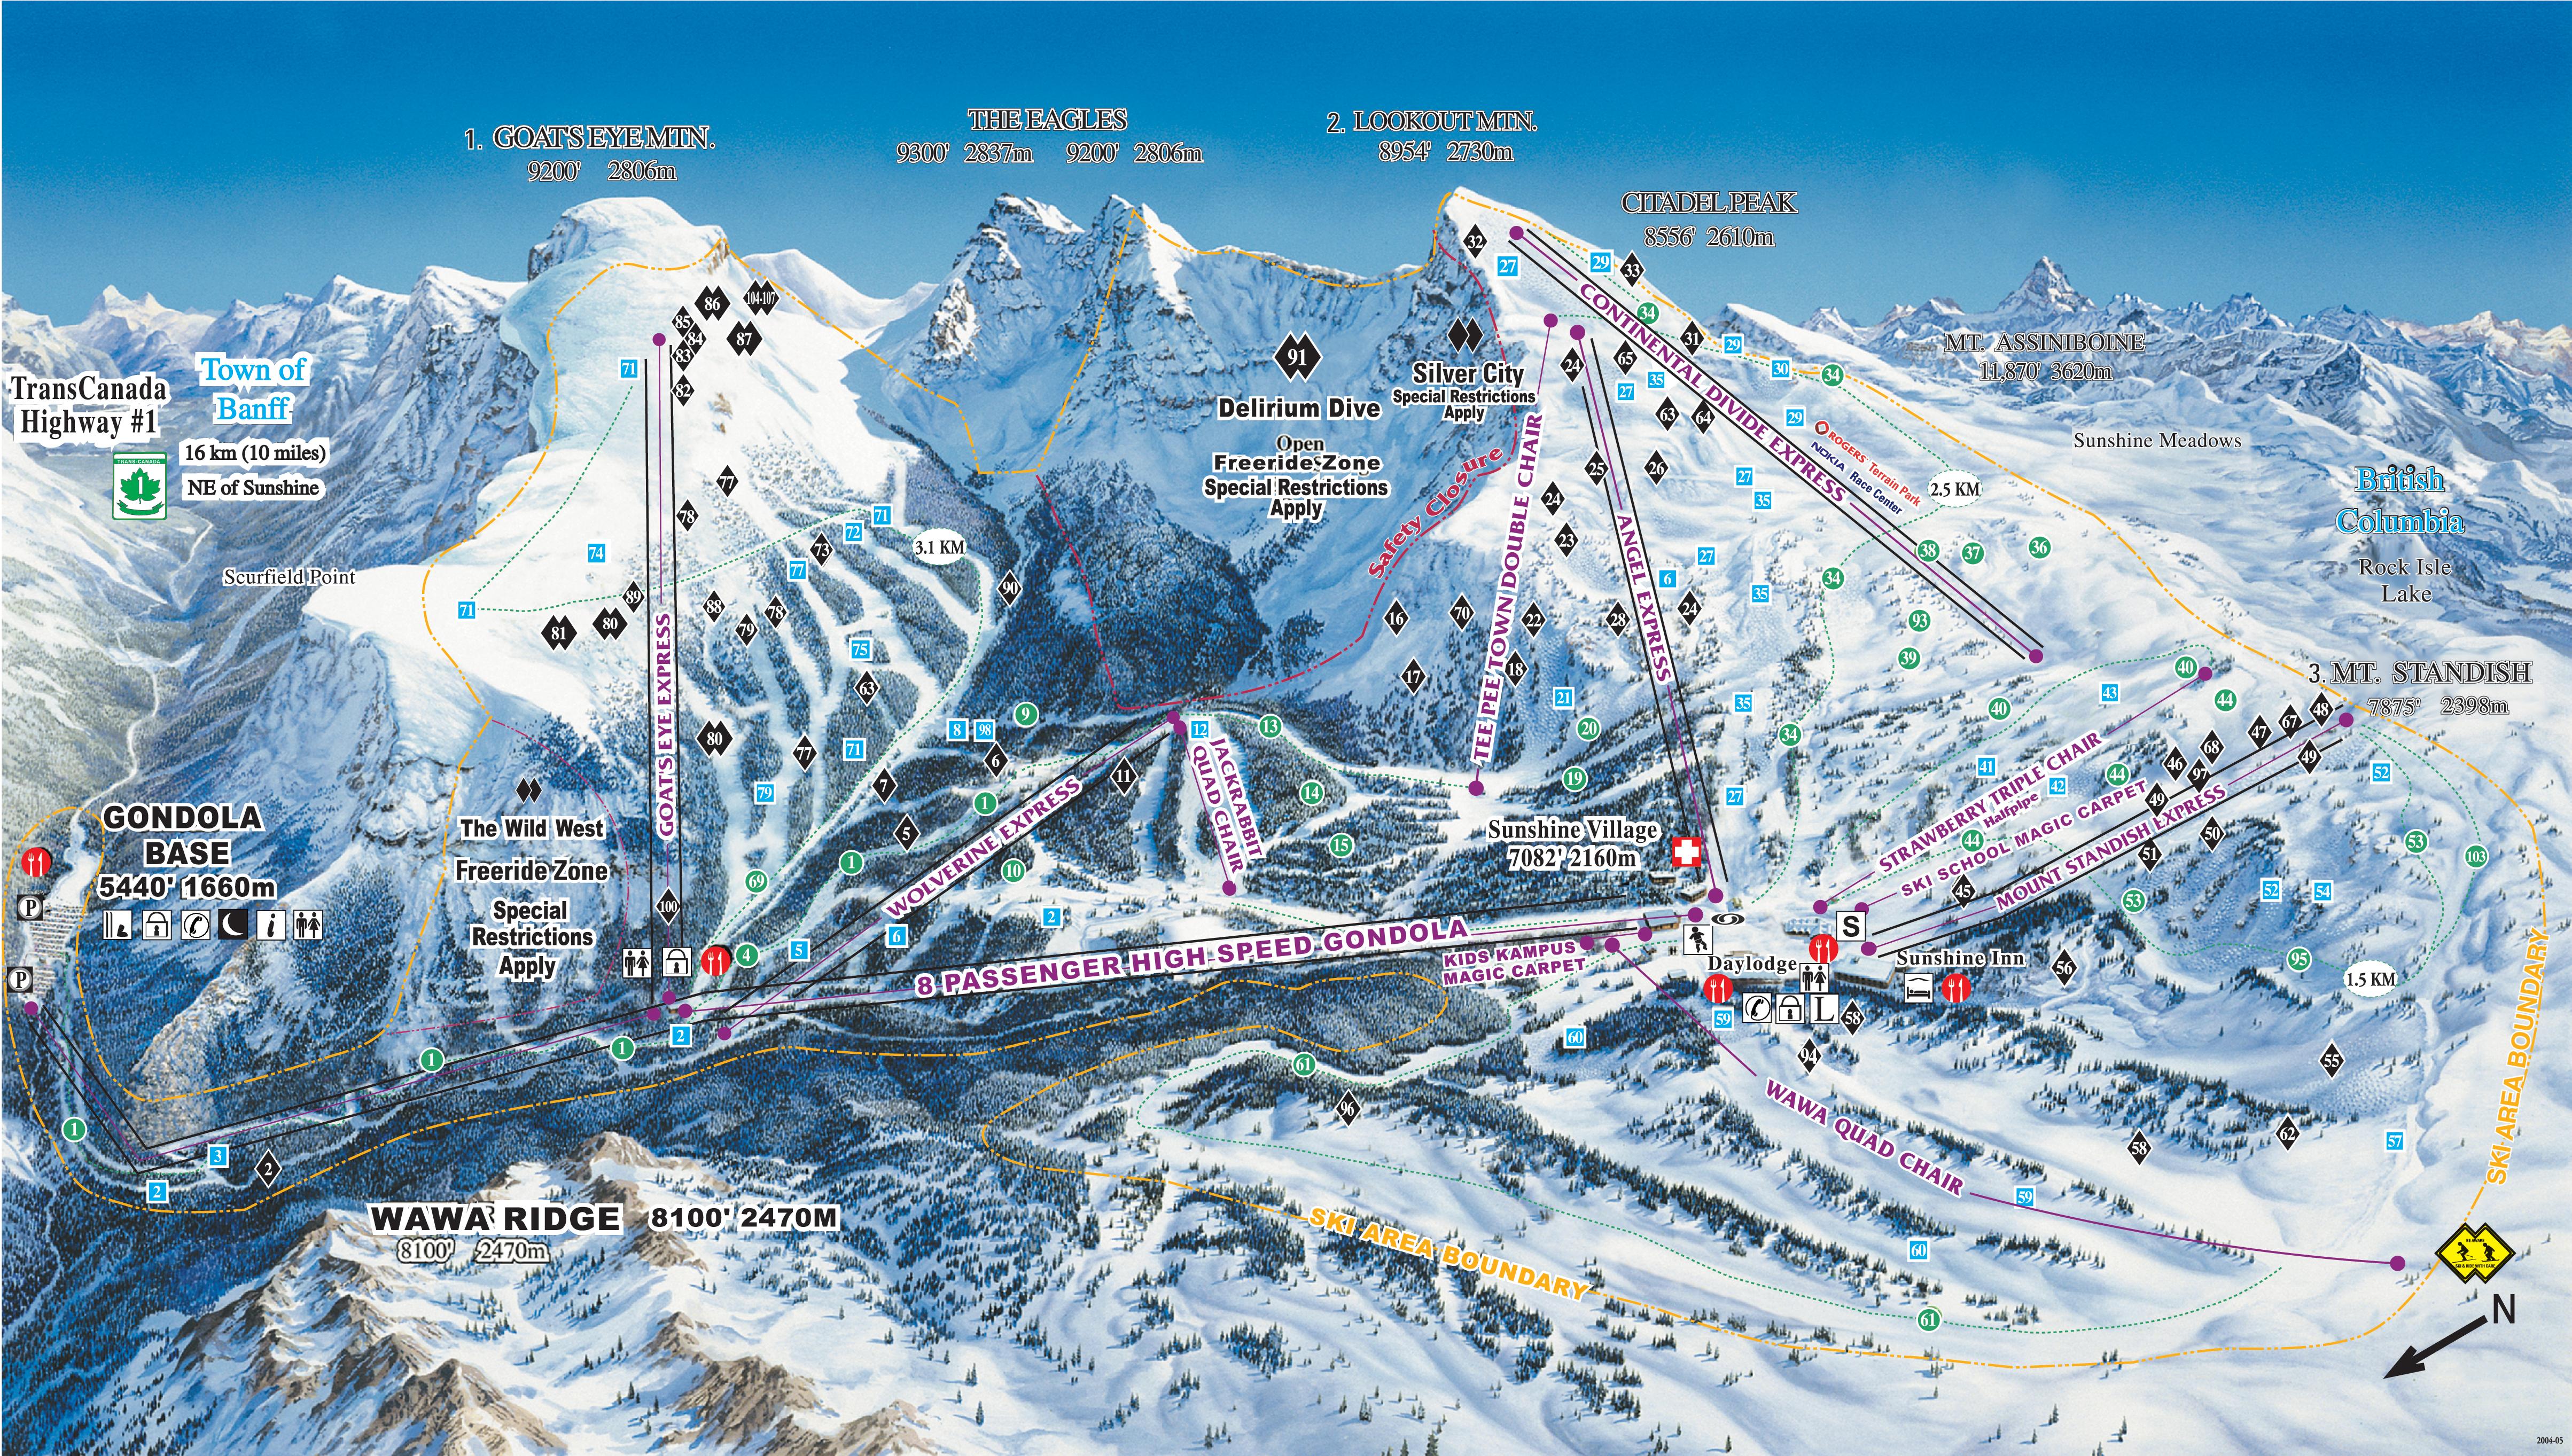 Banff/Lake Louise/Sunshine Trail Map/Webcams